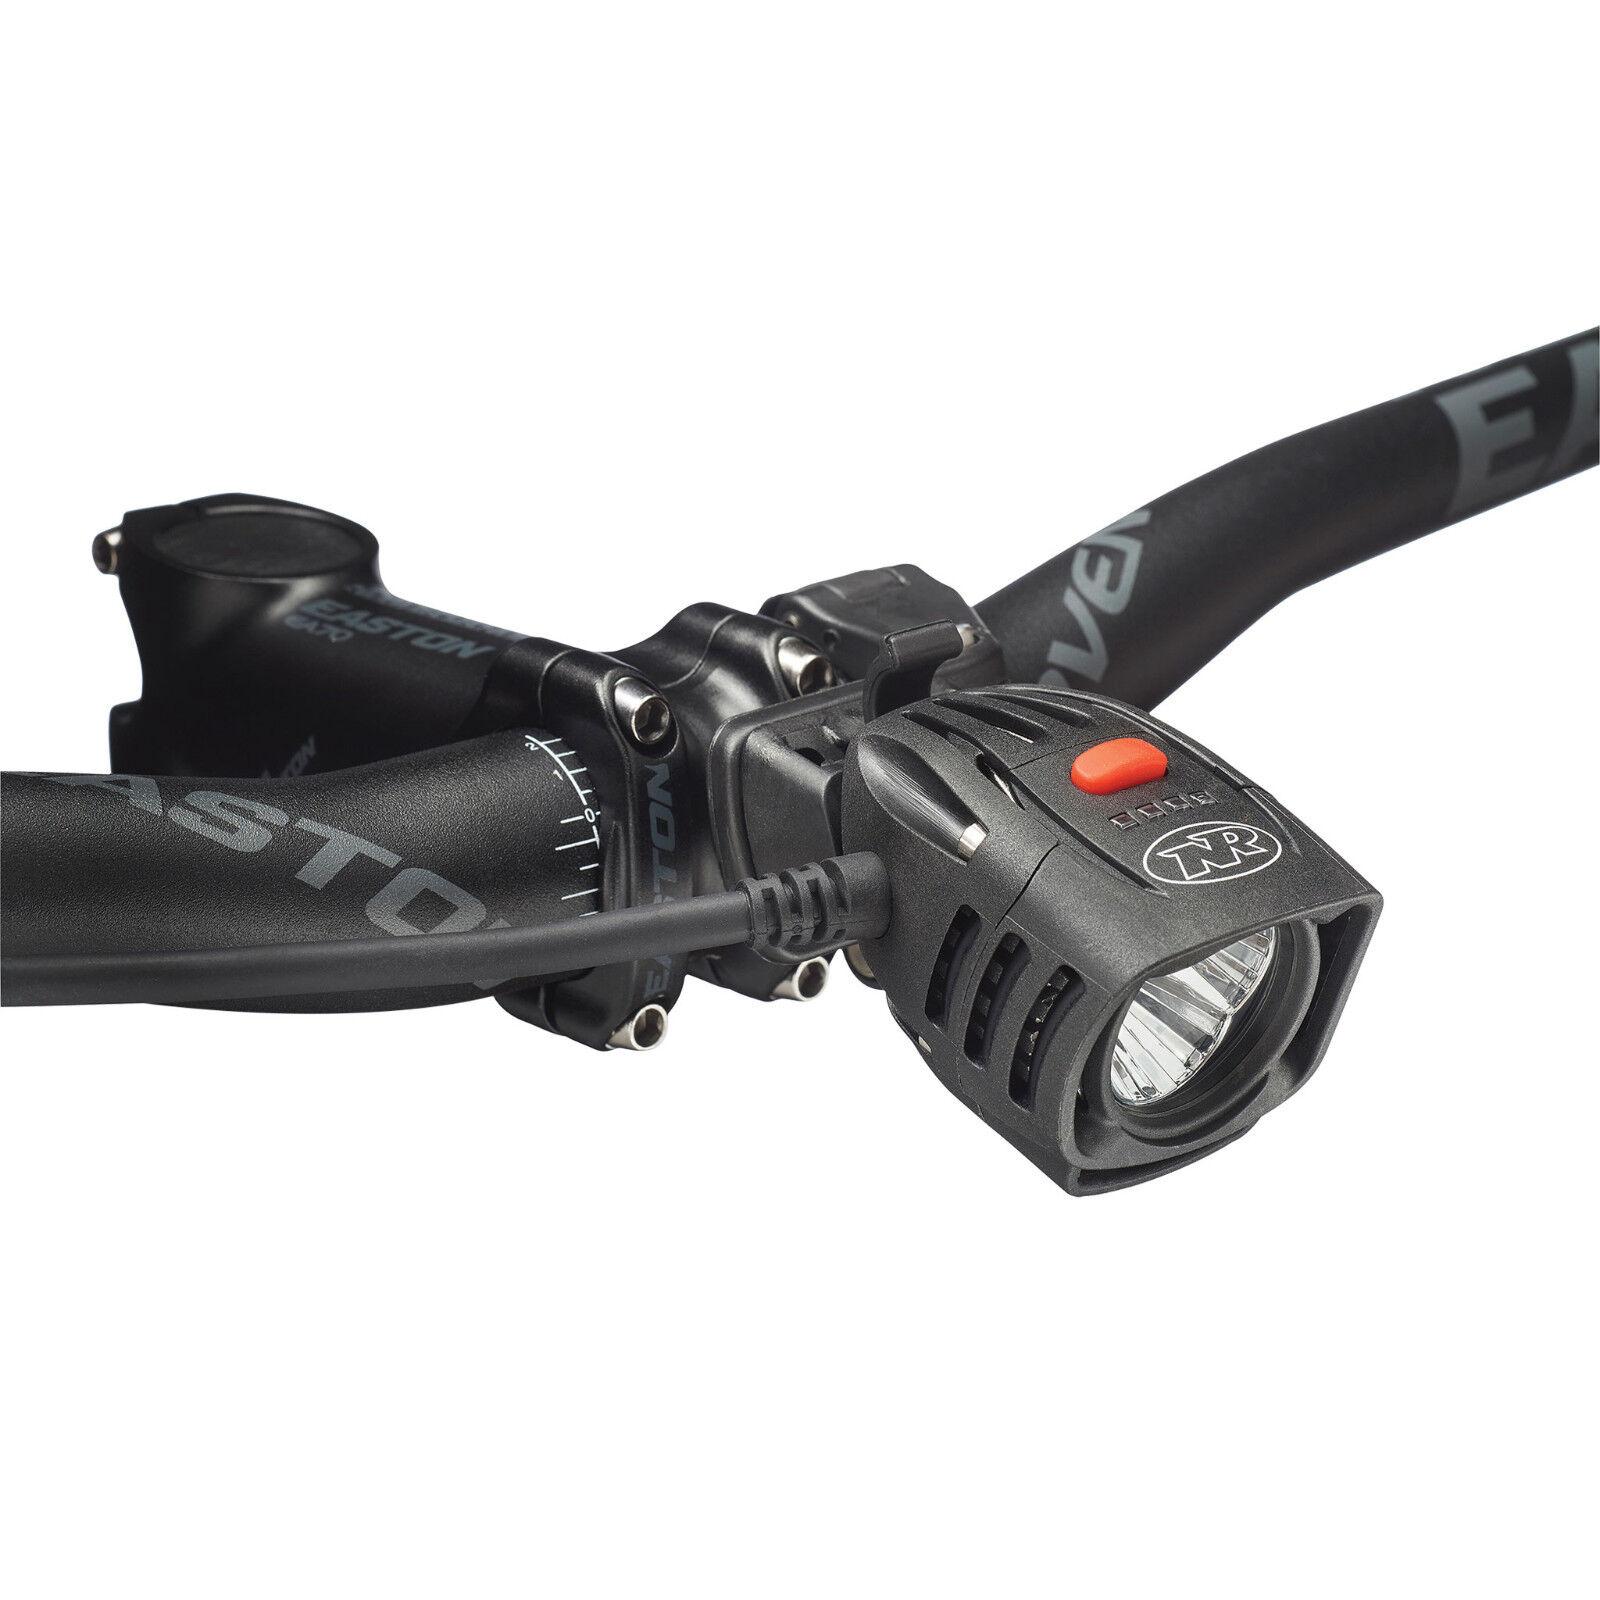 NiteRider Pro 2200 Race phare Vélo Lumière Vélo Lumen Rechargeable USB